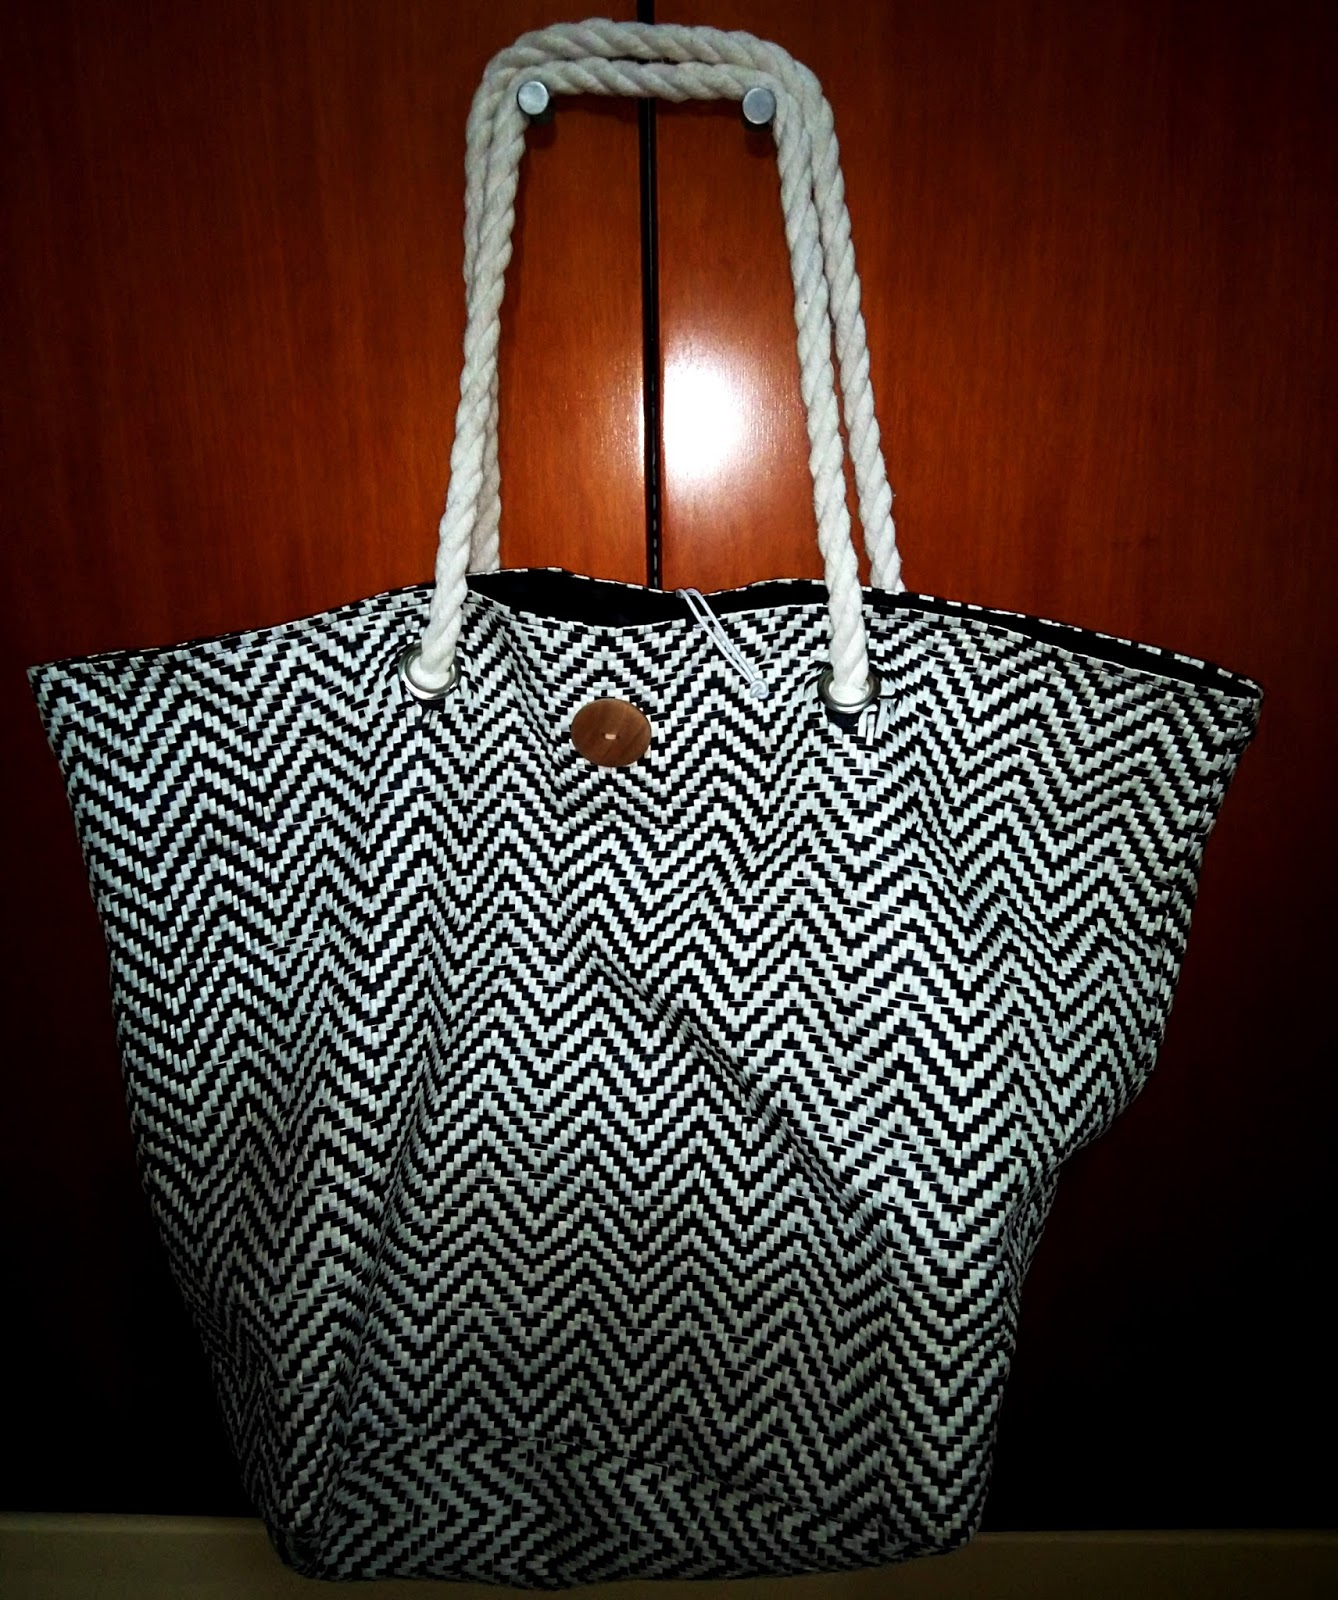 d29330503d0 Αρχικά, ο λόγος που επισκέφθηκα τα Jumbo, ήταν επειδή ήθελα να αγοράσω μια  τσάντα για την παραλία μιας και οι προηγούμενες χαλάσανε!